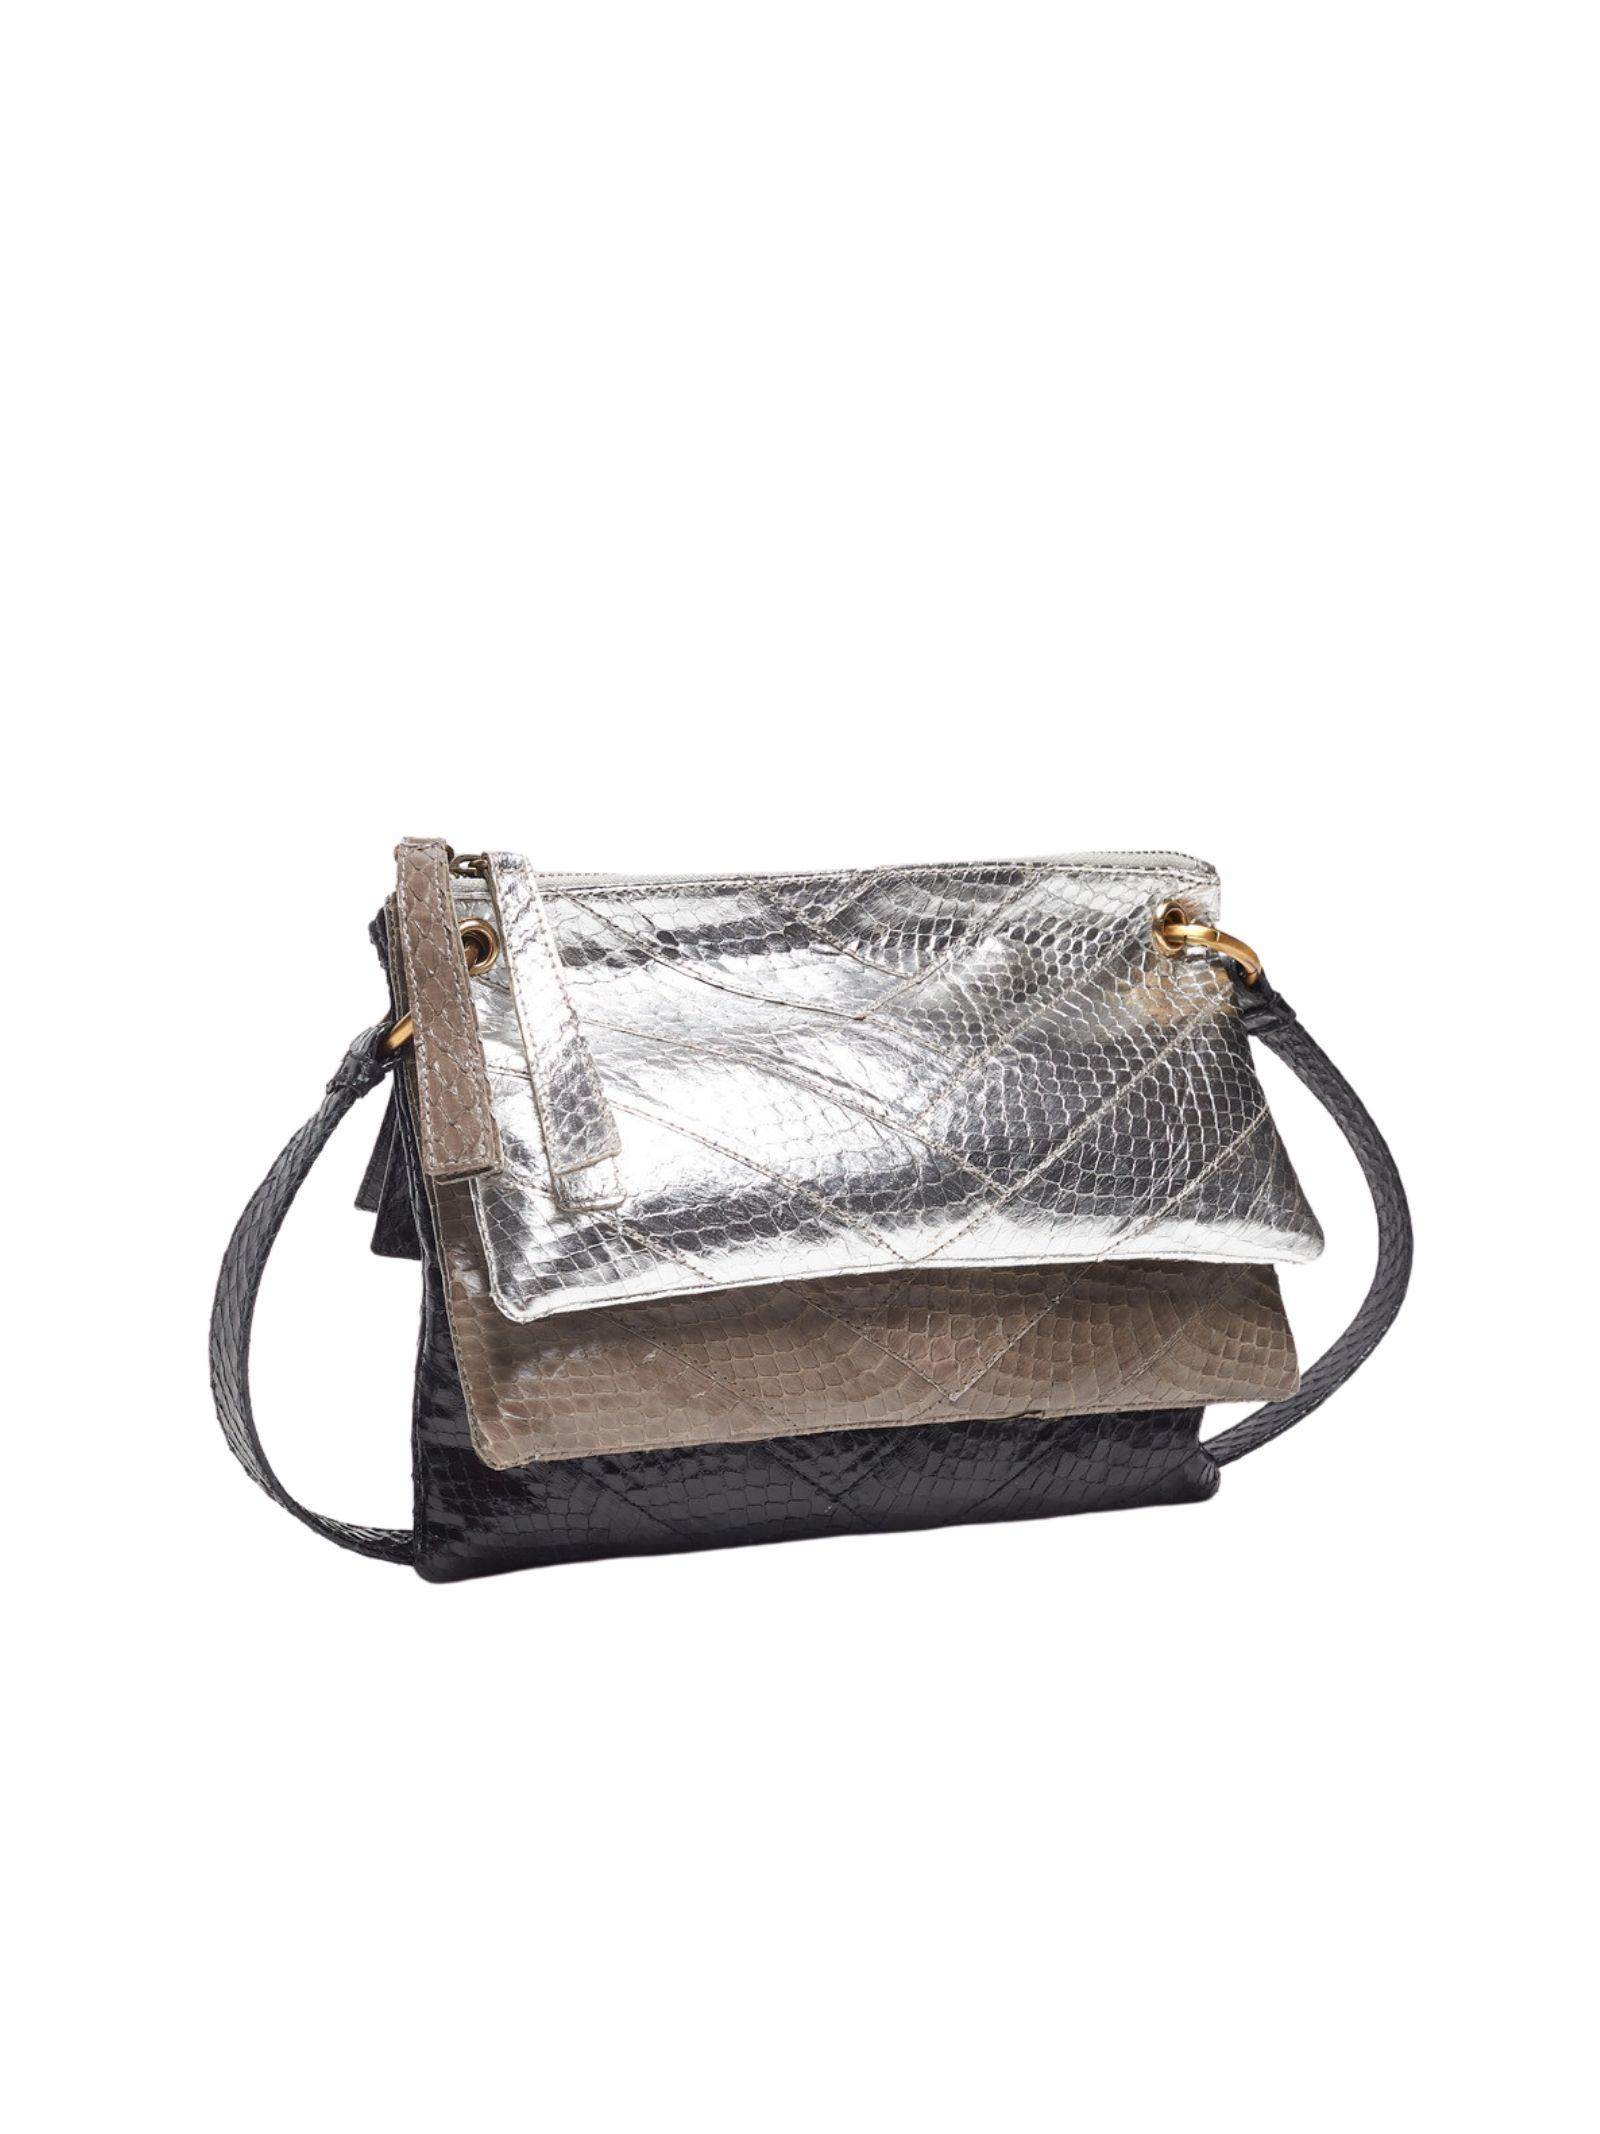 Women's Bags Black Multicolor Maliparmi | Bags and backpacks | BD00490140920B99